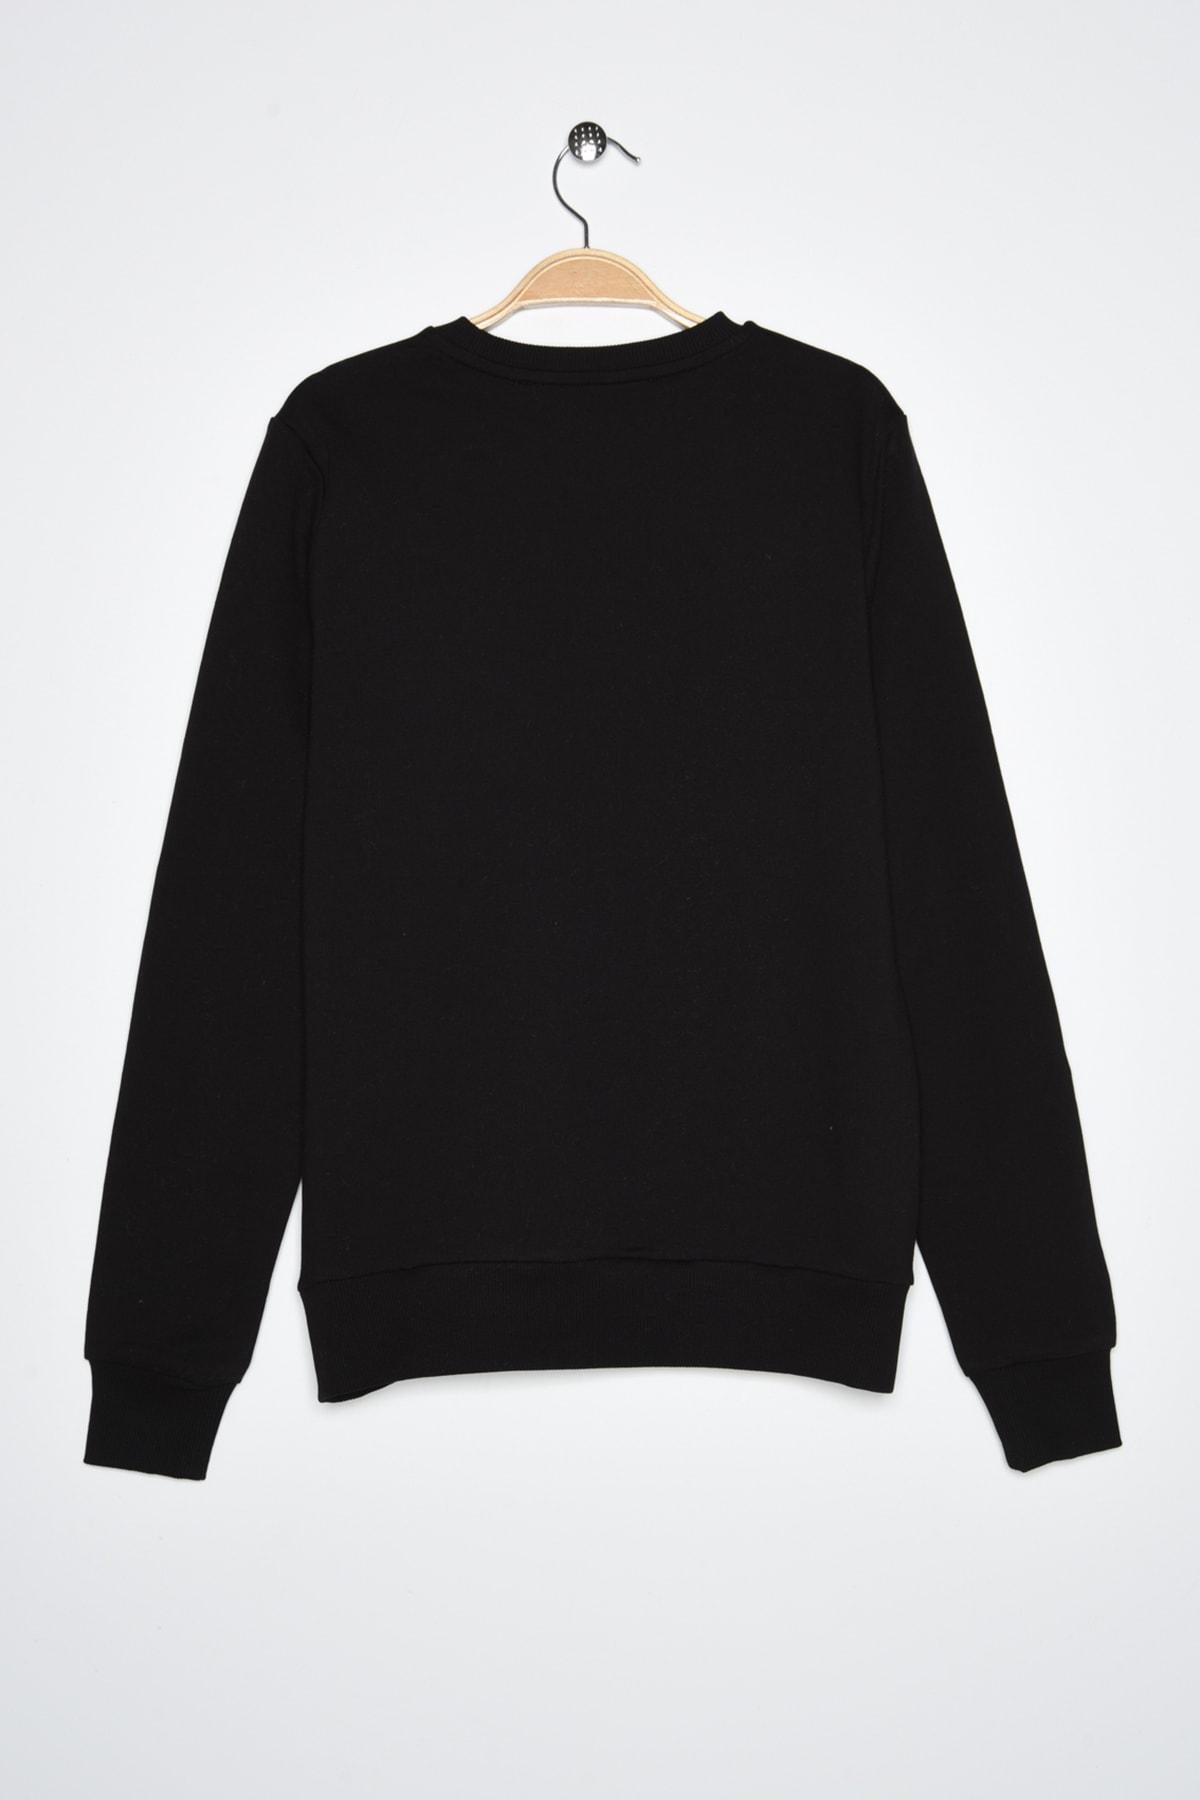 New Balance Kadın Spor Sweatshirt - CREW NECK  - WTC0303-BK 2